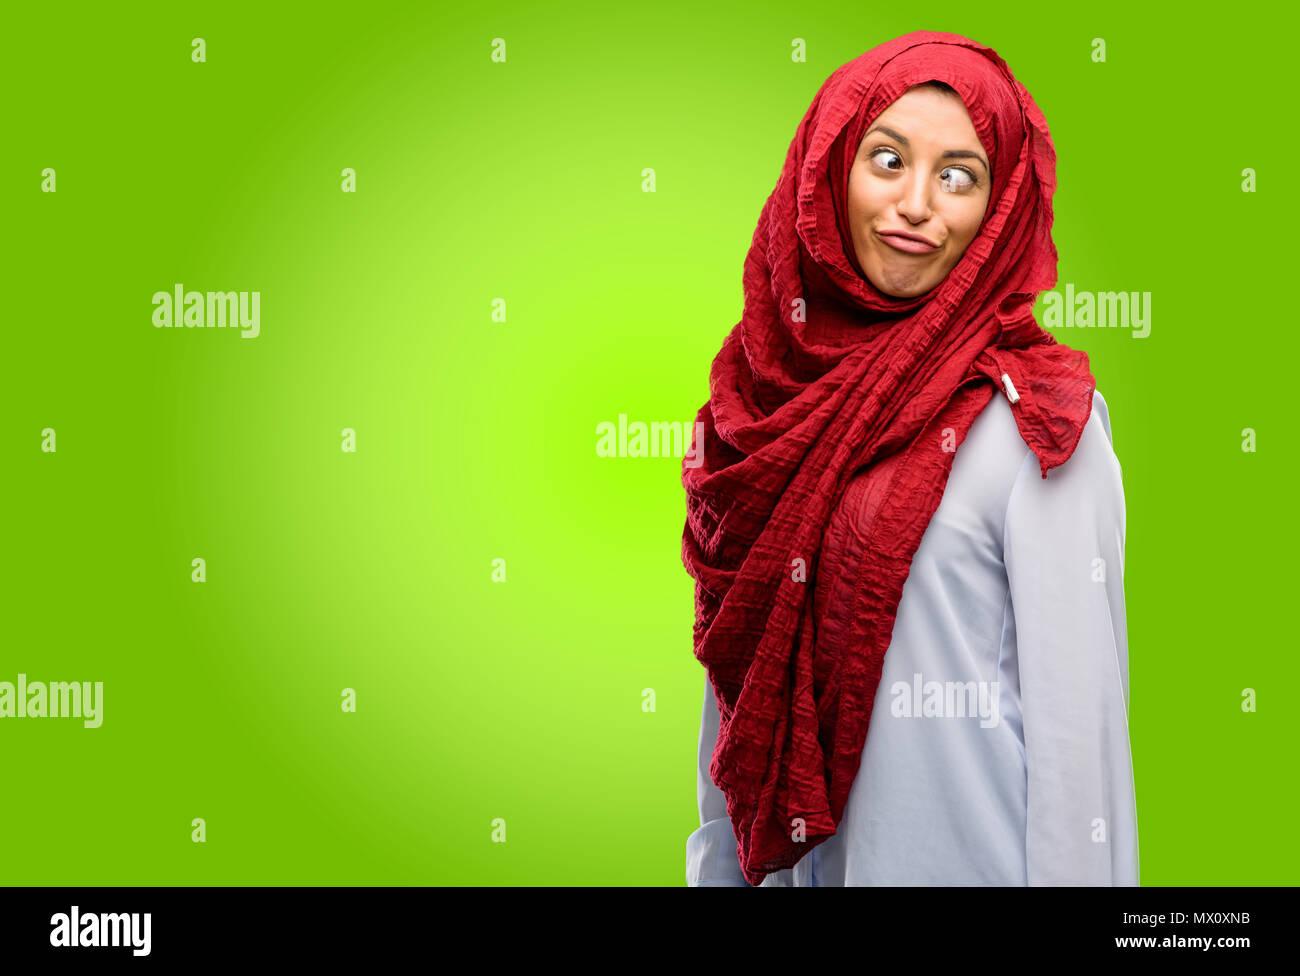 Jeune Femme Arabe Portant Le Hijab Faire Drole De Visage Berner Photo Stock Alamy